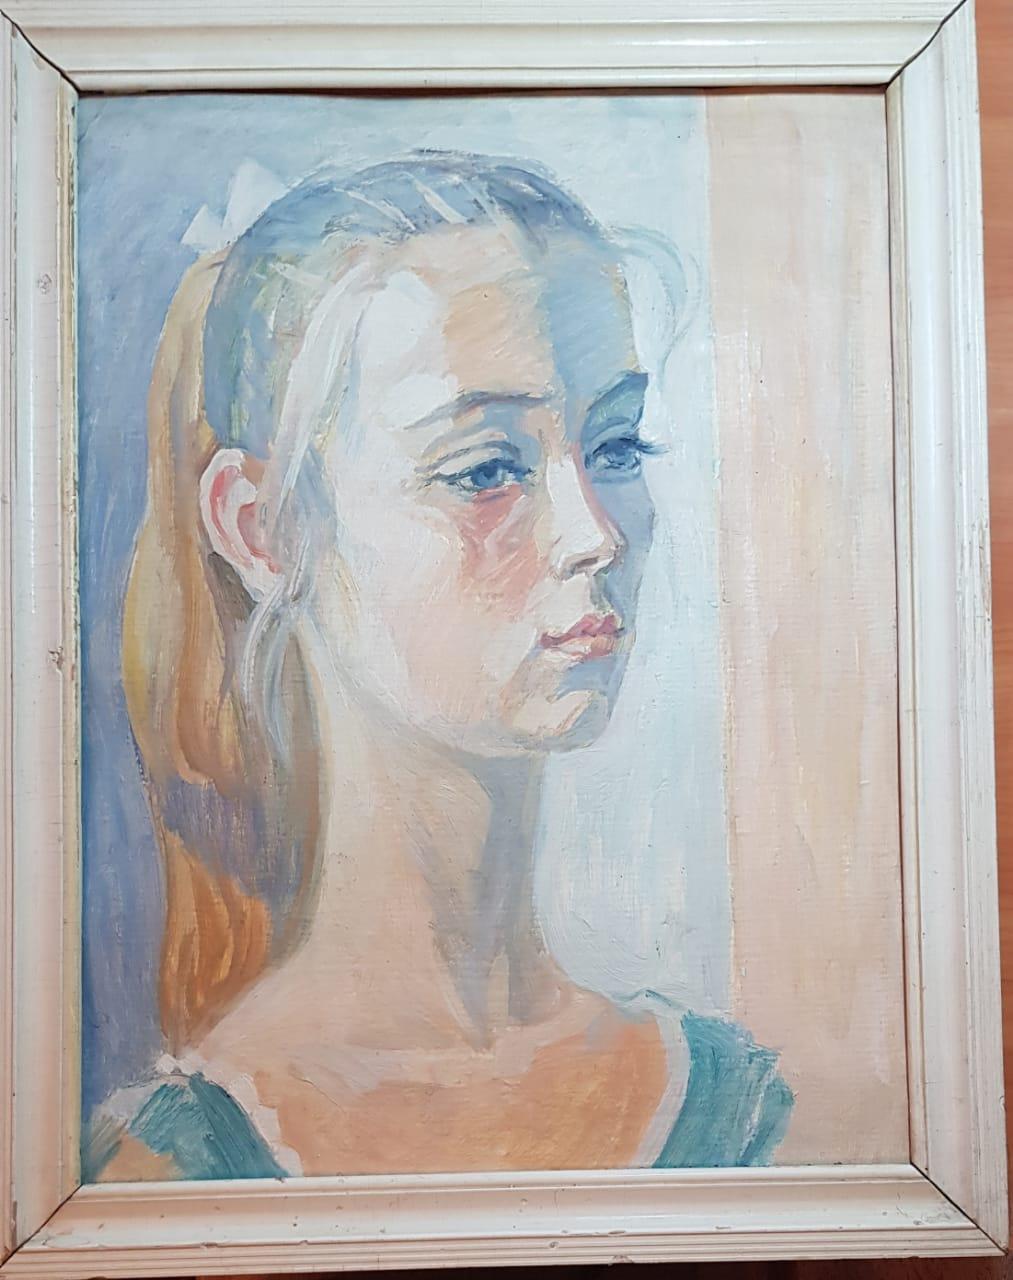 Yuri Semenovich Evseev. Niece Yulka 10 years